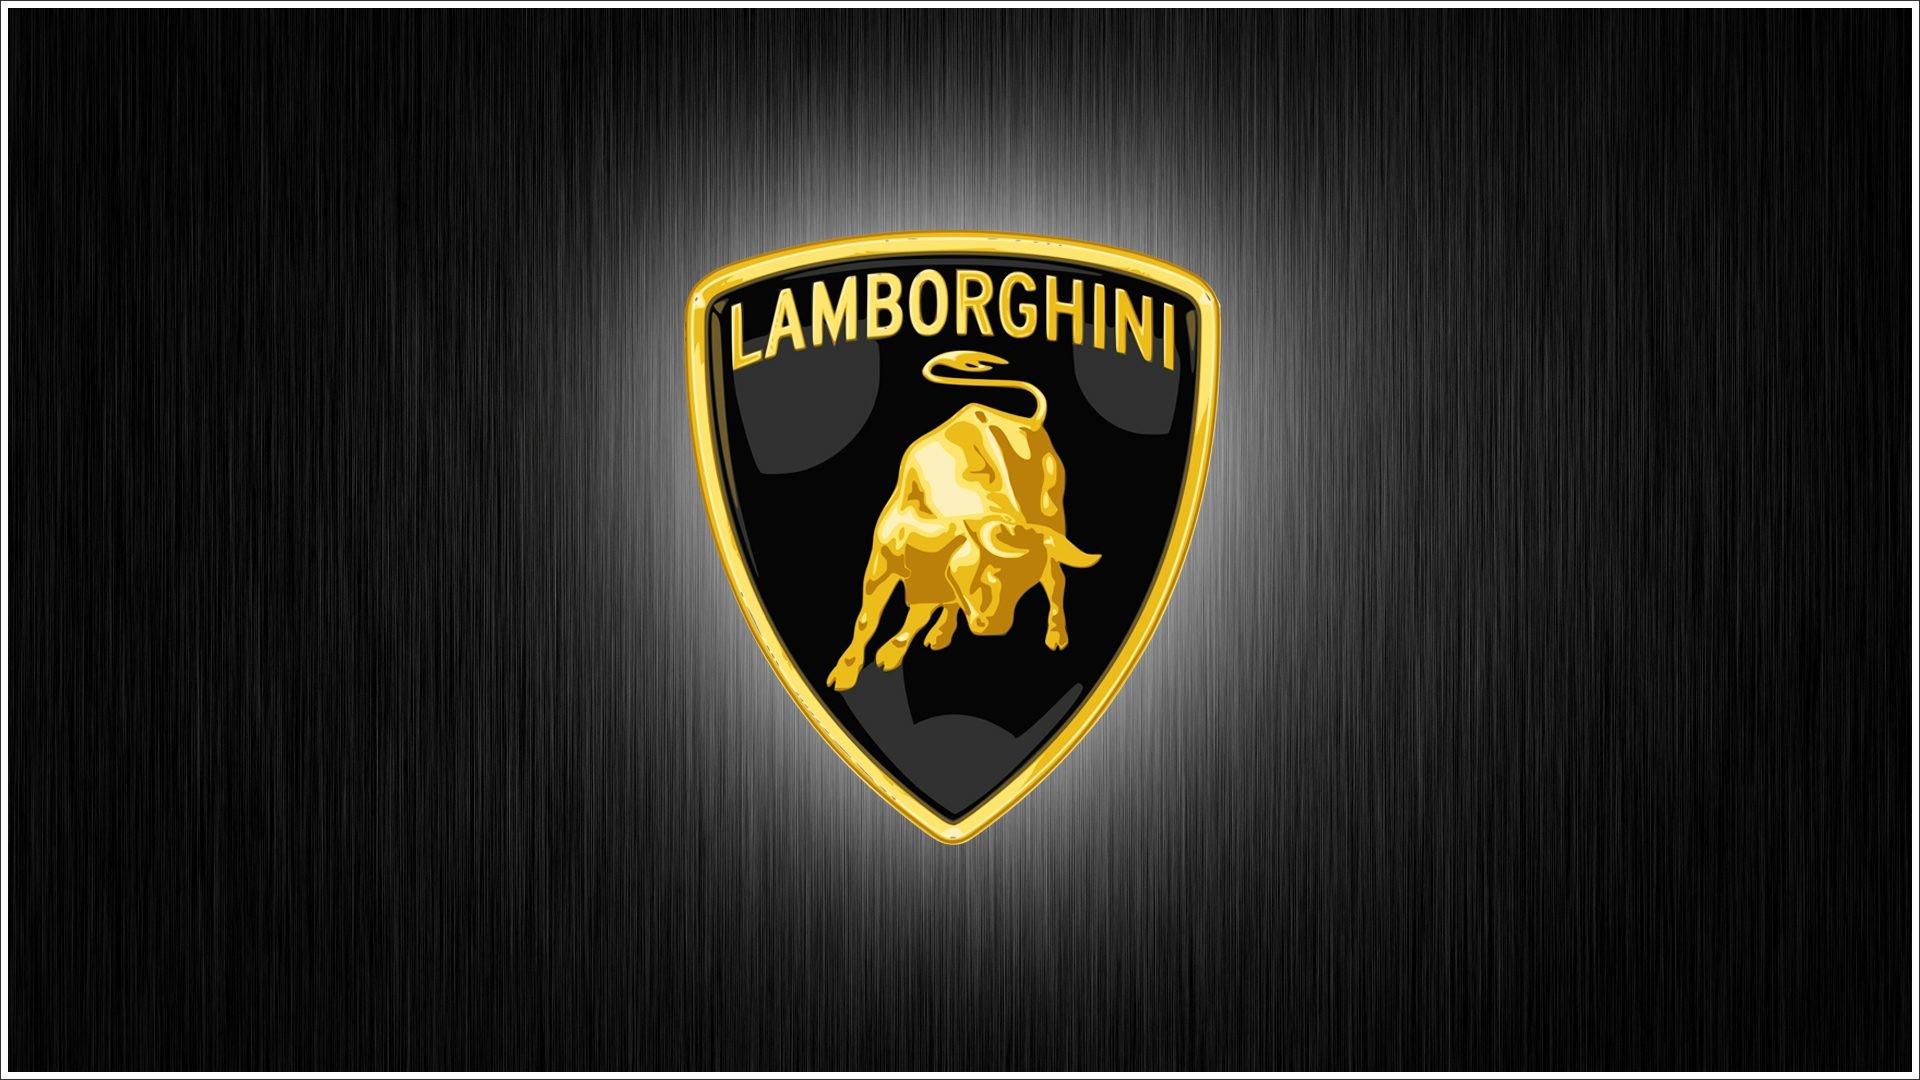 Lamborghini Logo Wallpaper 183 ①